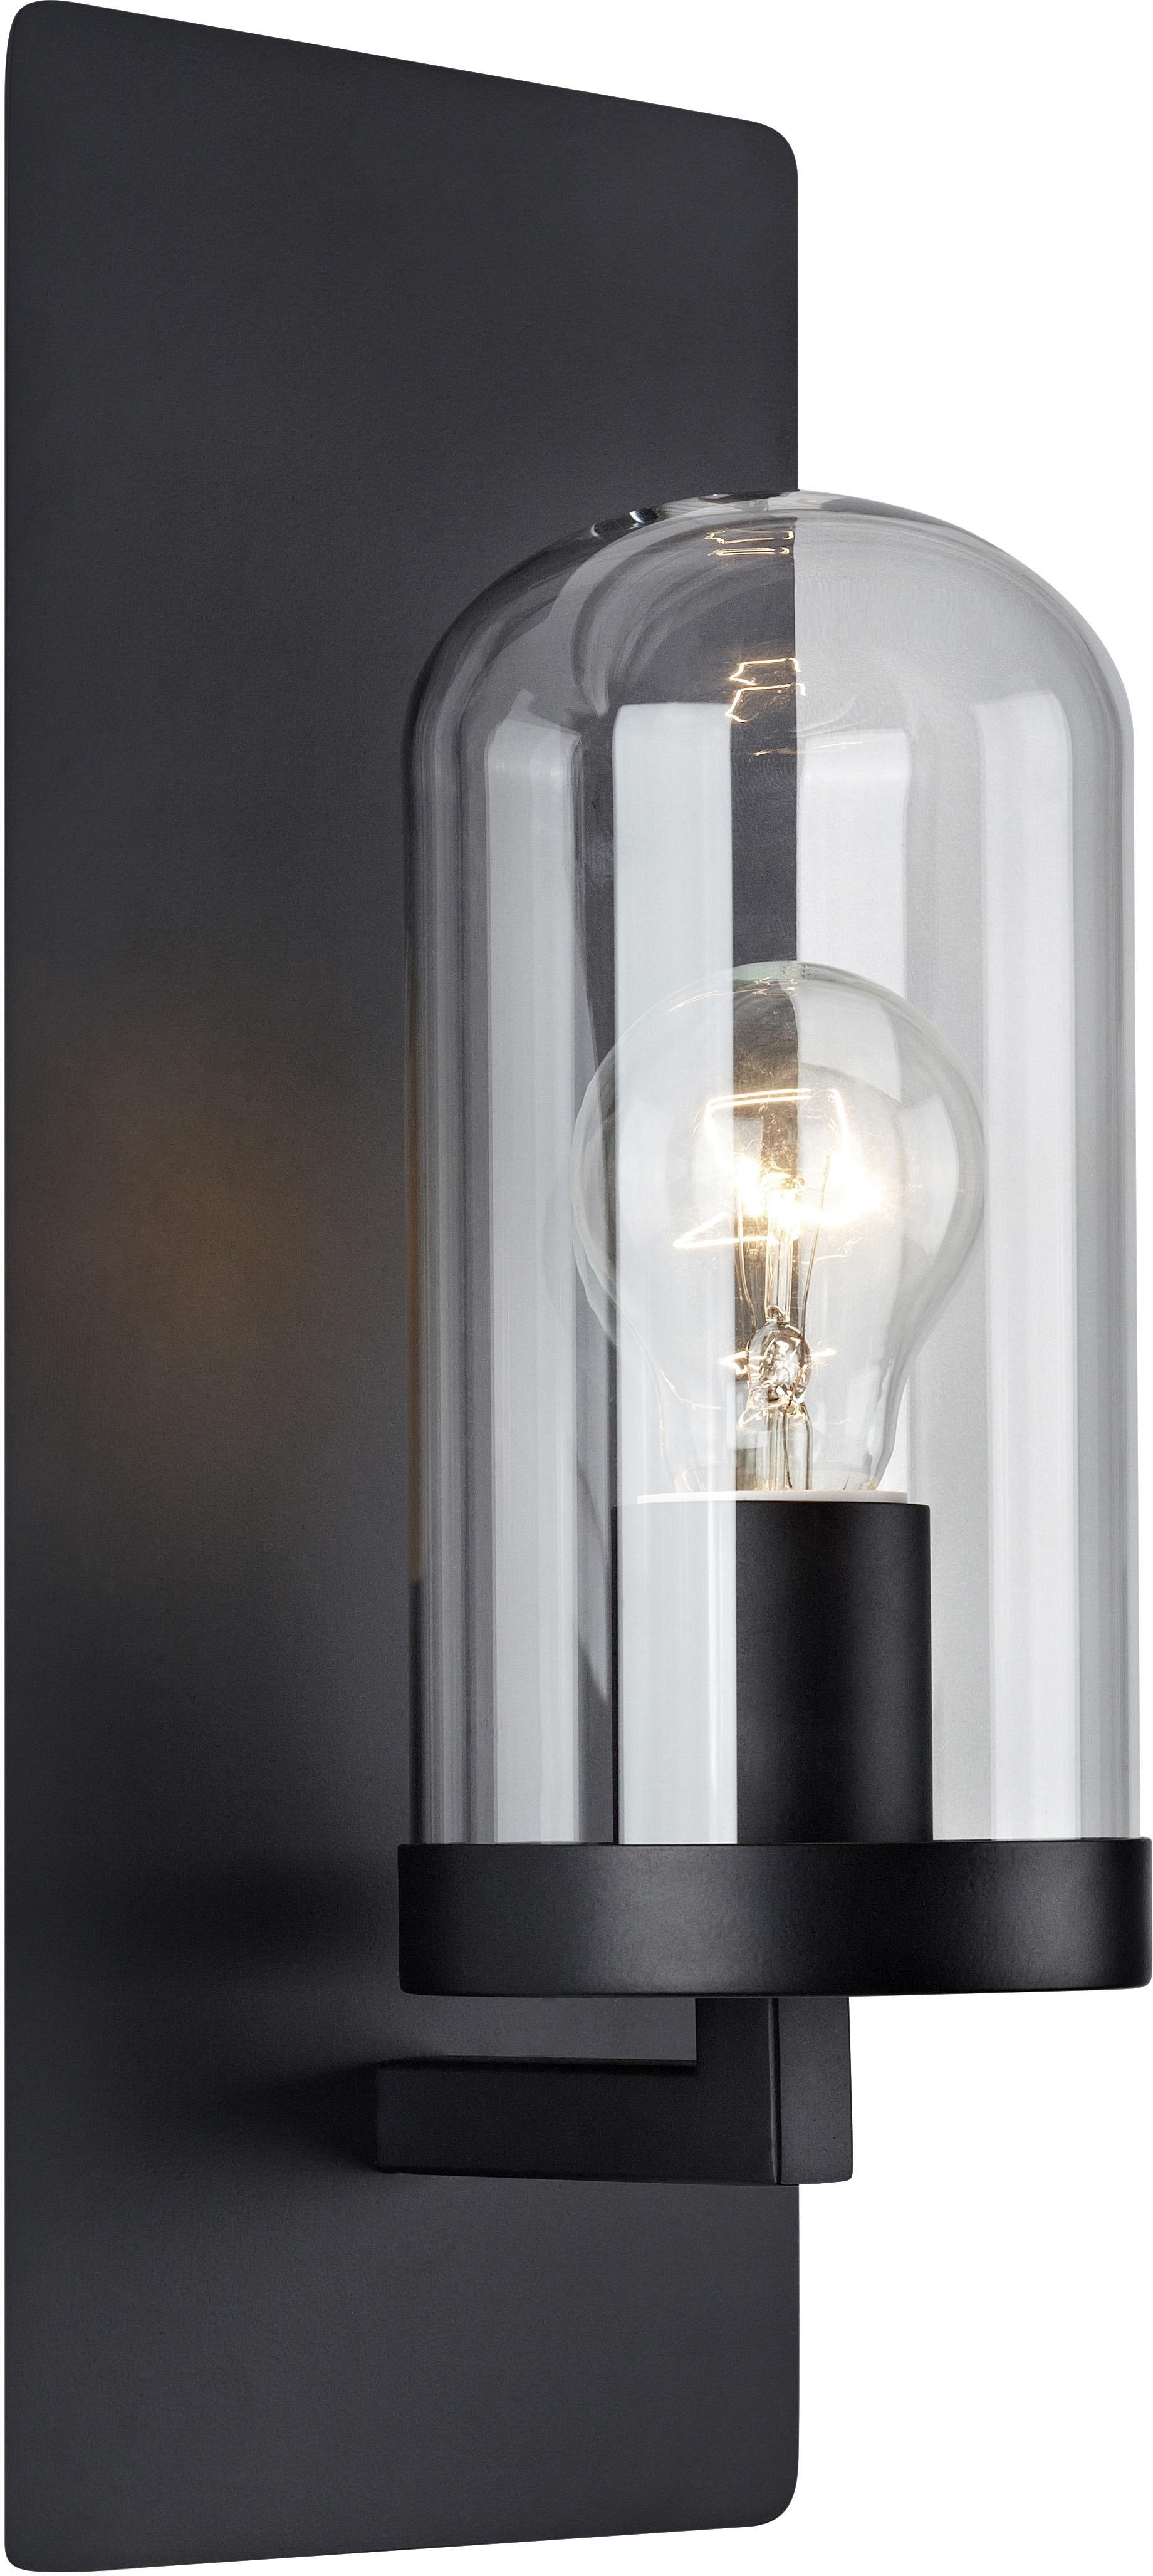 Applique con spina James, Paralume: vetro, Nero, Larg. 15 x Alt. 35 cm